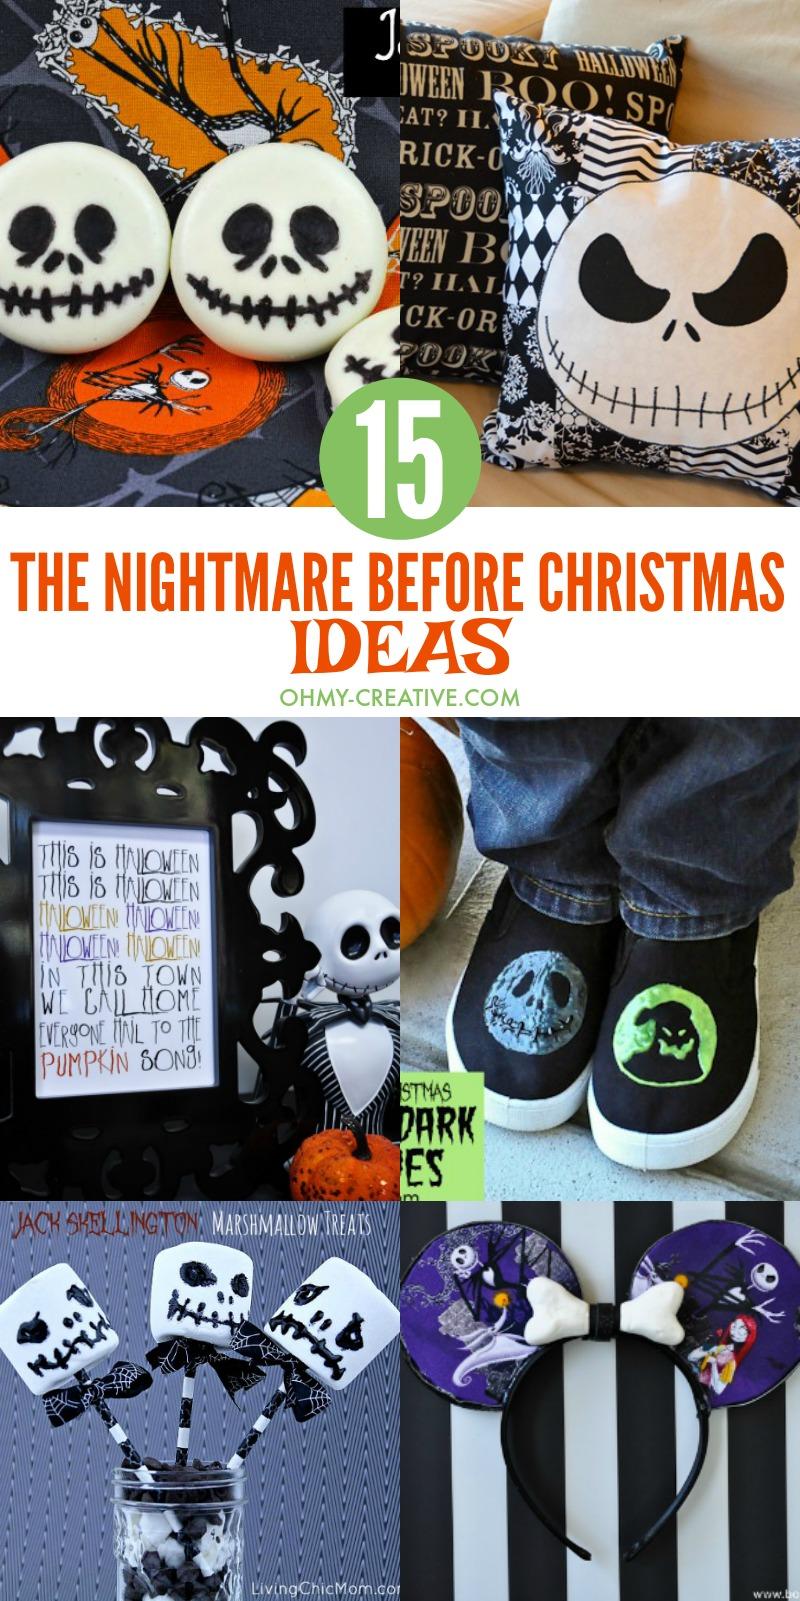 15 Fun The Nightmare Before Christmas Ideas